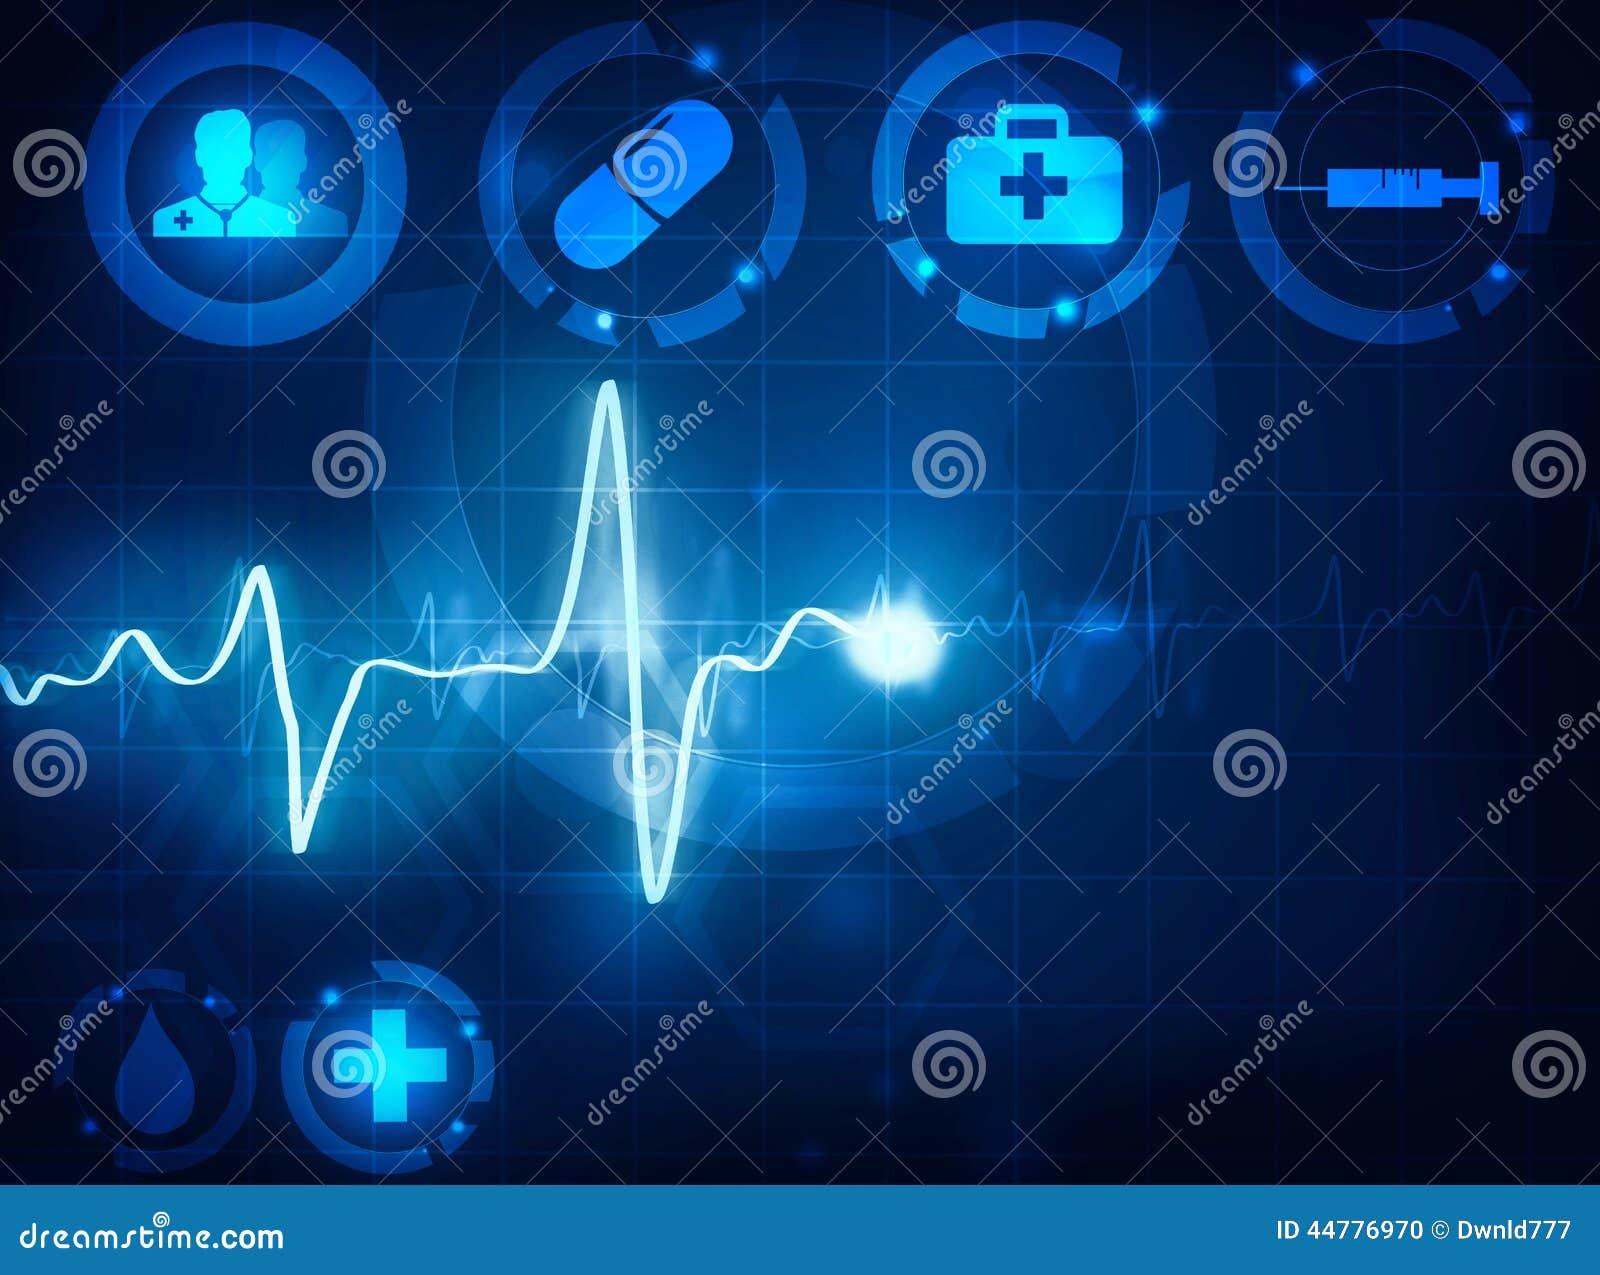 Cardiogram Wave Medical Background Stock Illustration